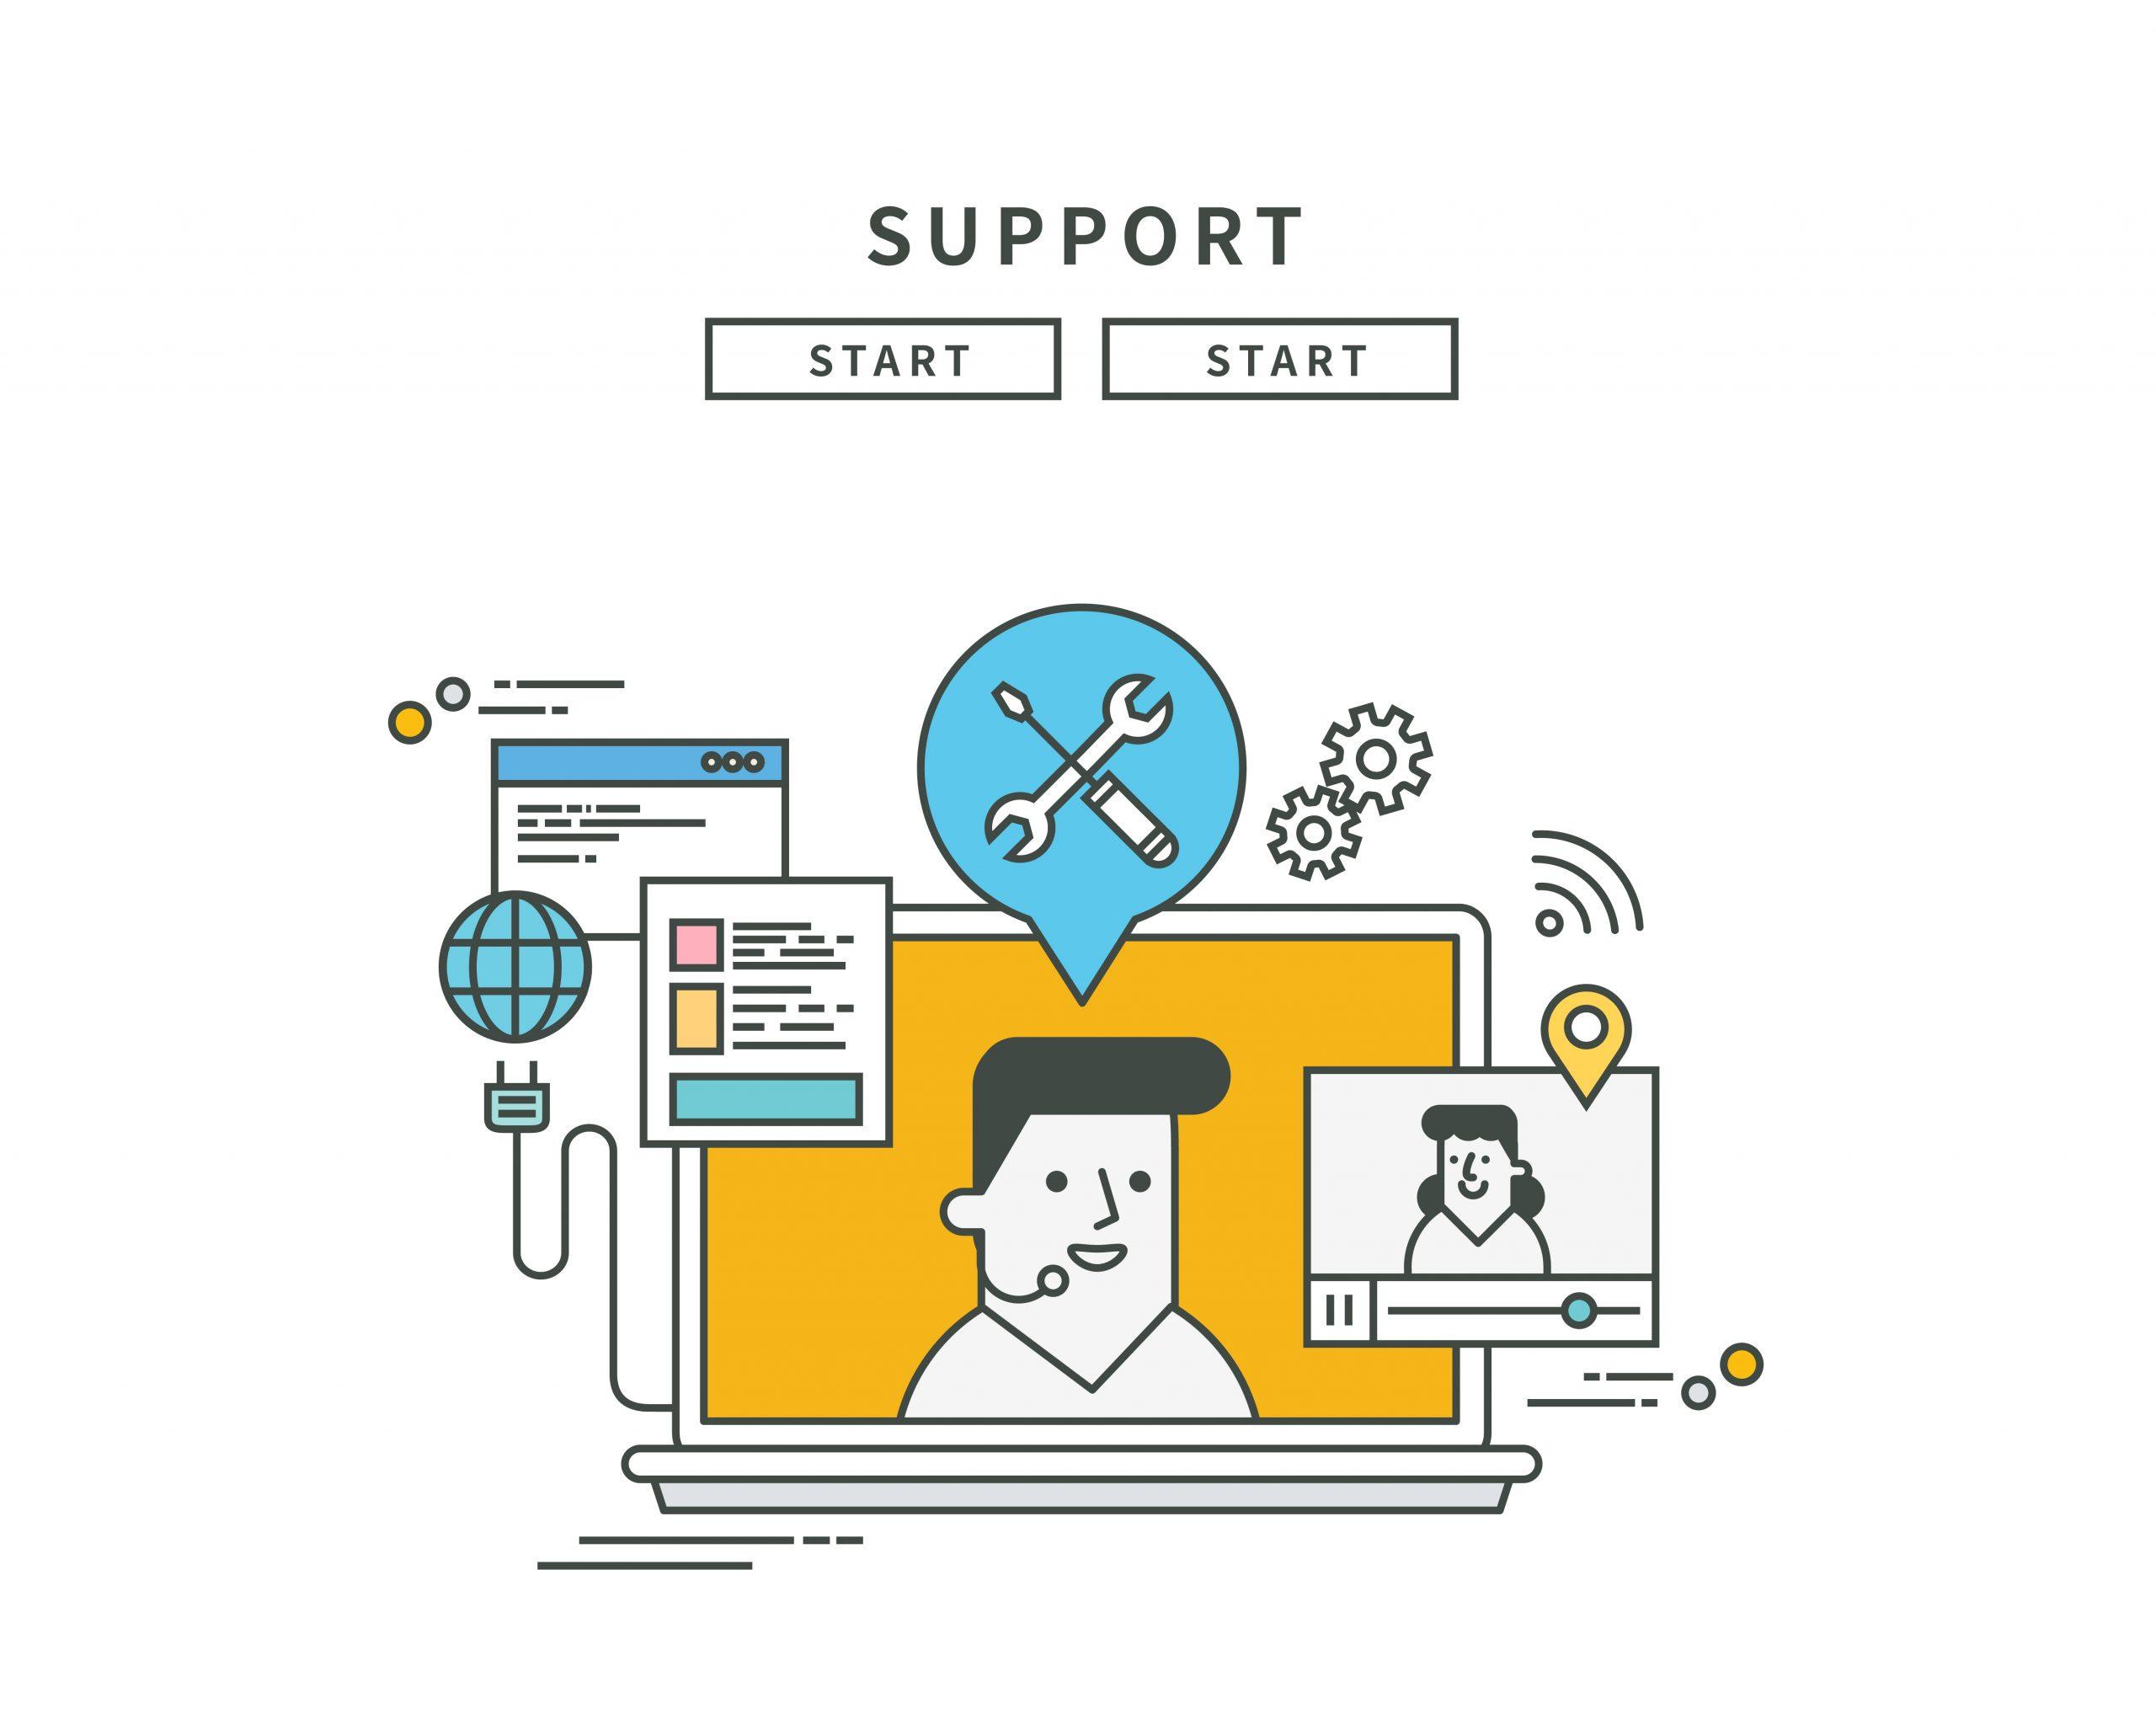 Simple,Line,Flat,Design,Of,Support,,Modern,Vector,Illustration